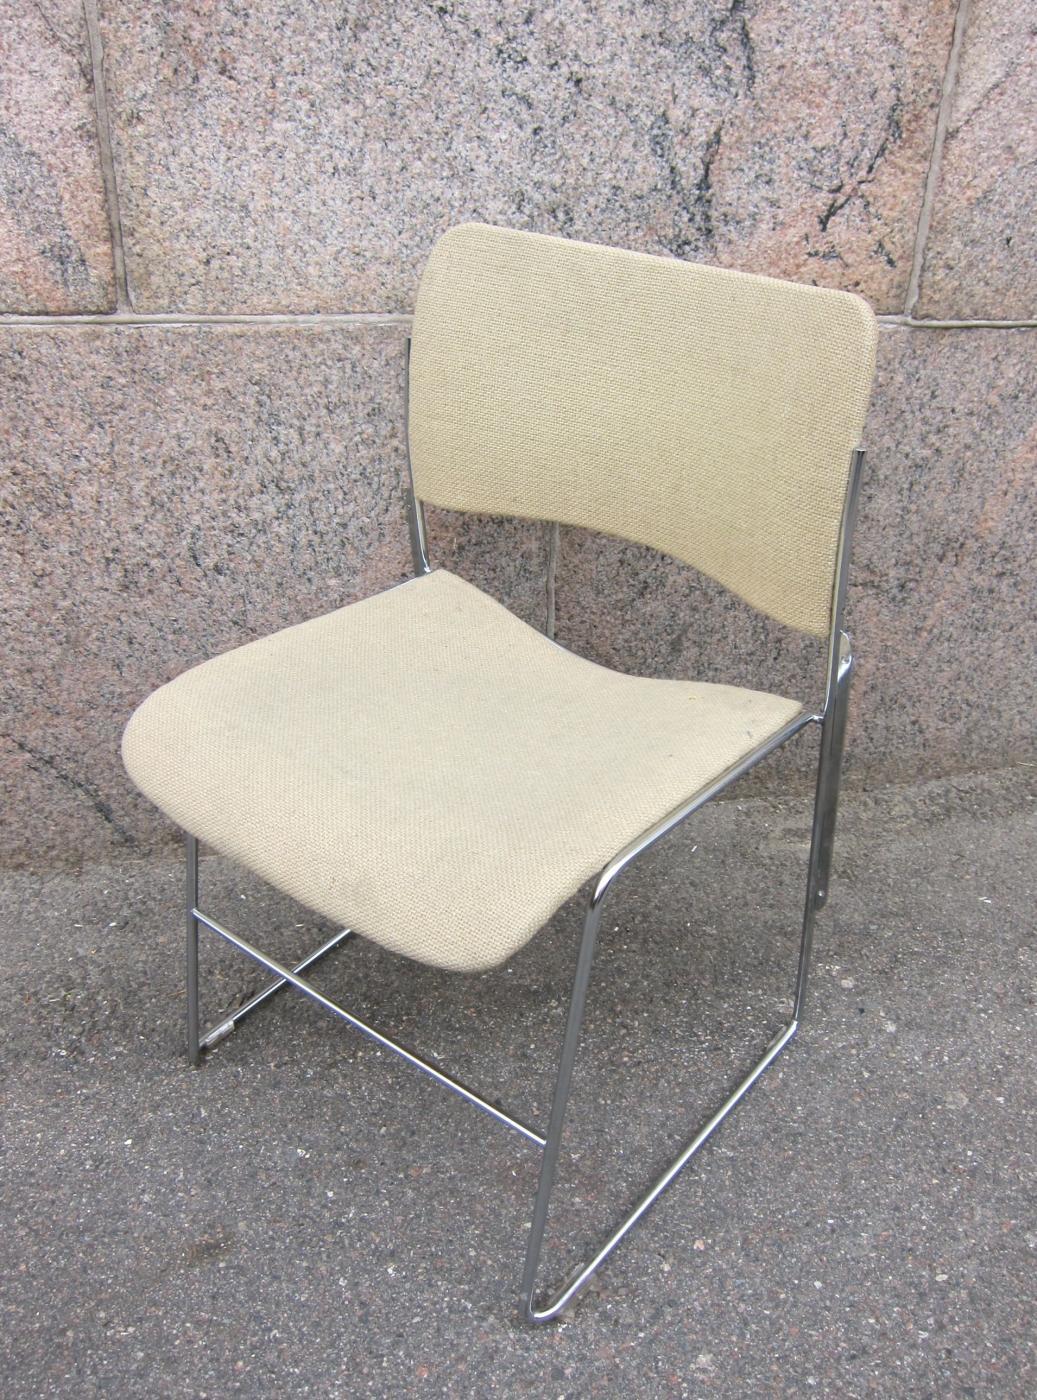 40_4_tuoli.jpg